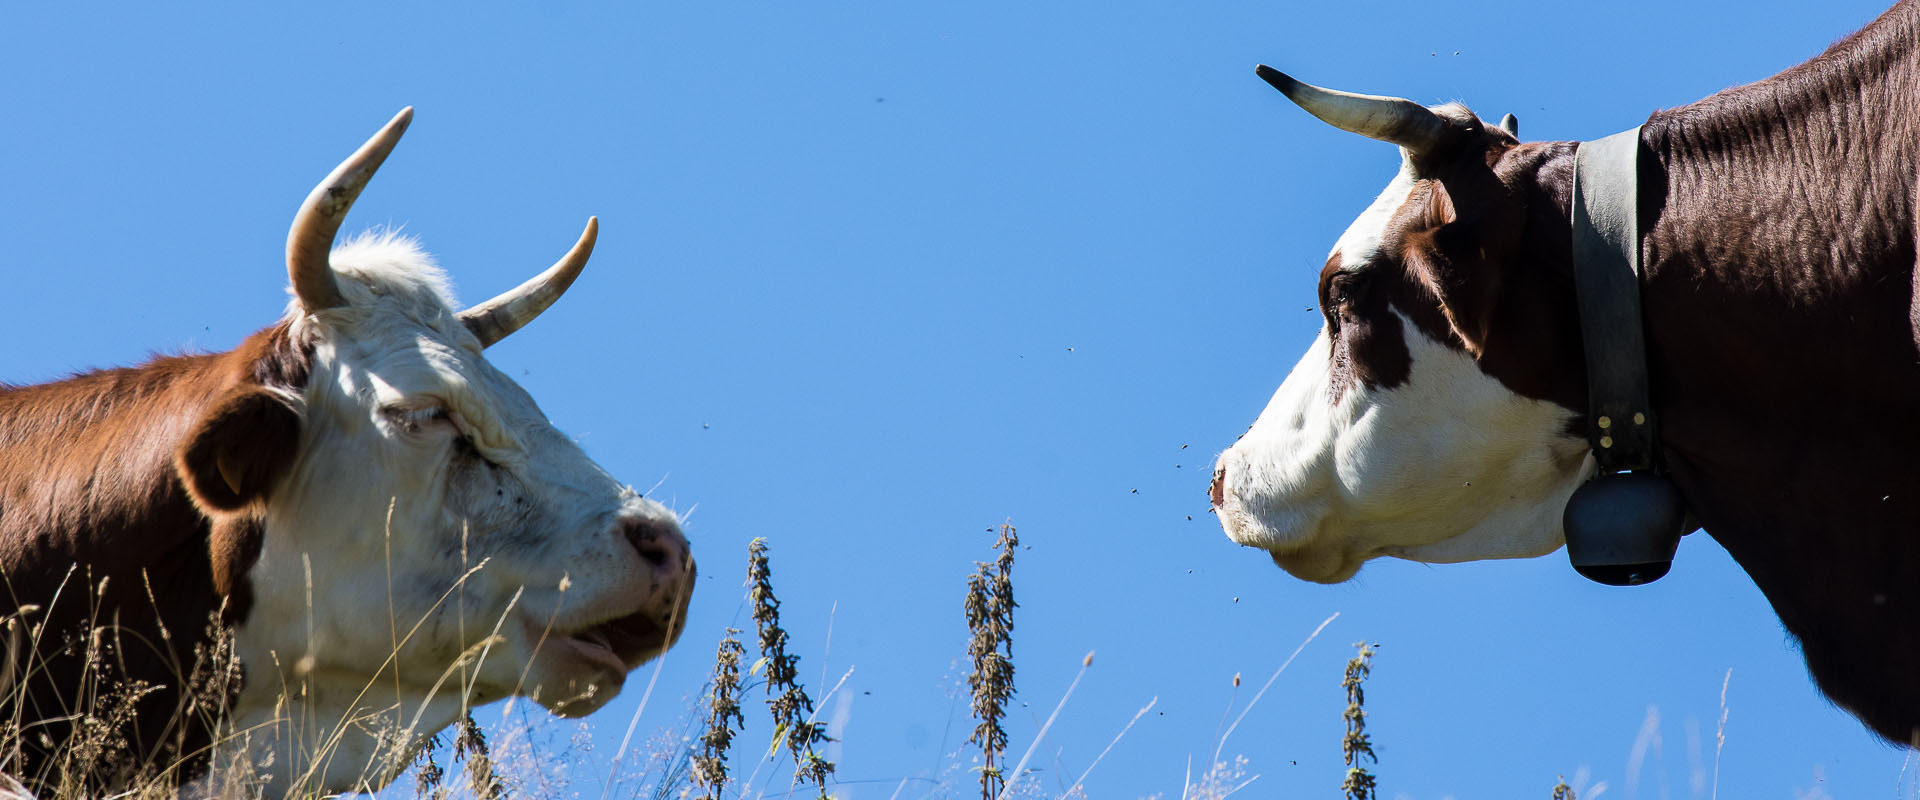 alpemoncerchio-mucche-dialoganti